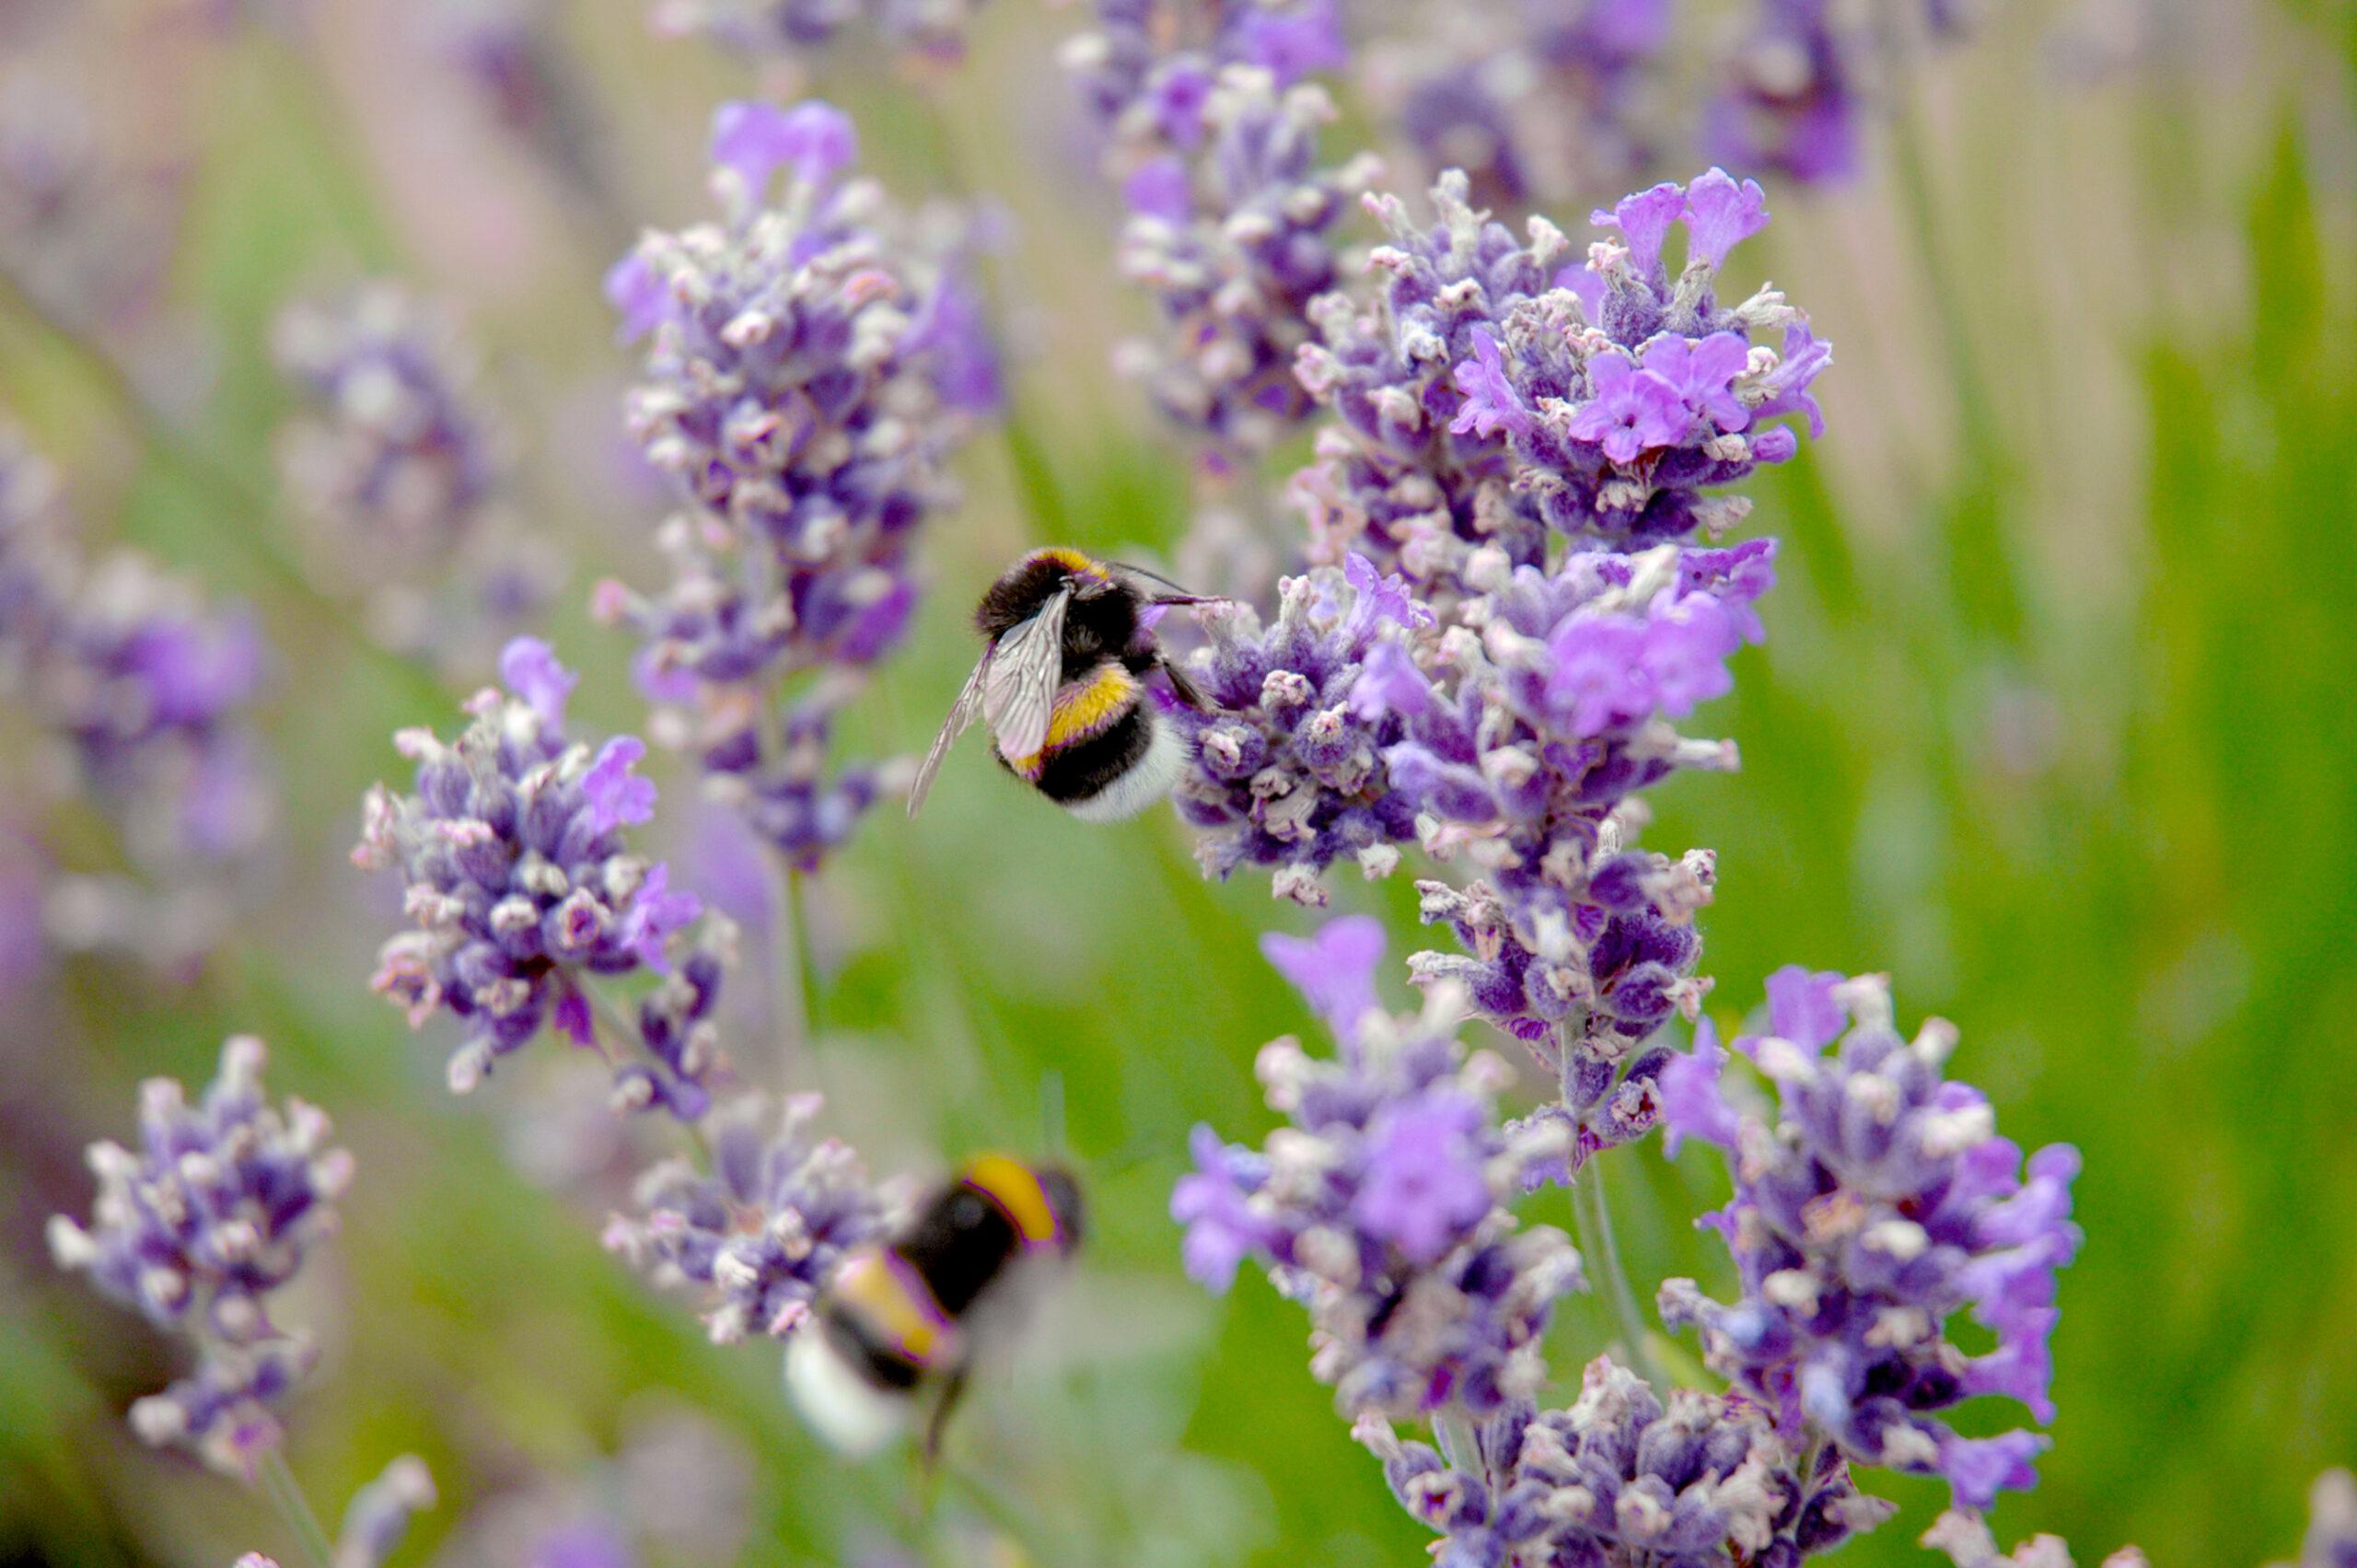 bijen in de falgatuinen